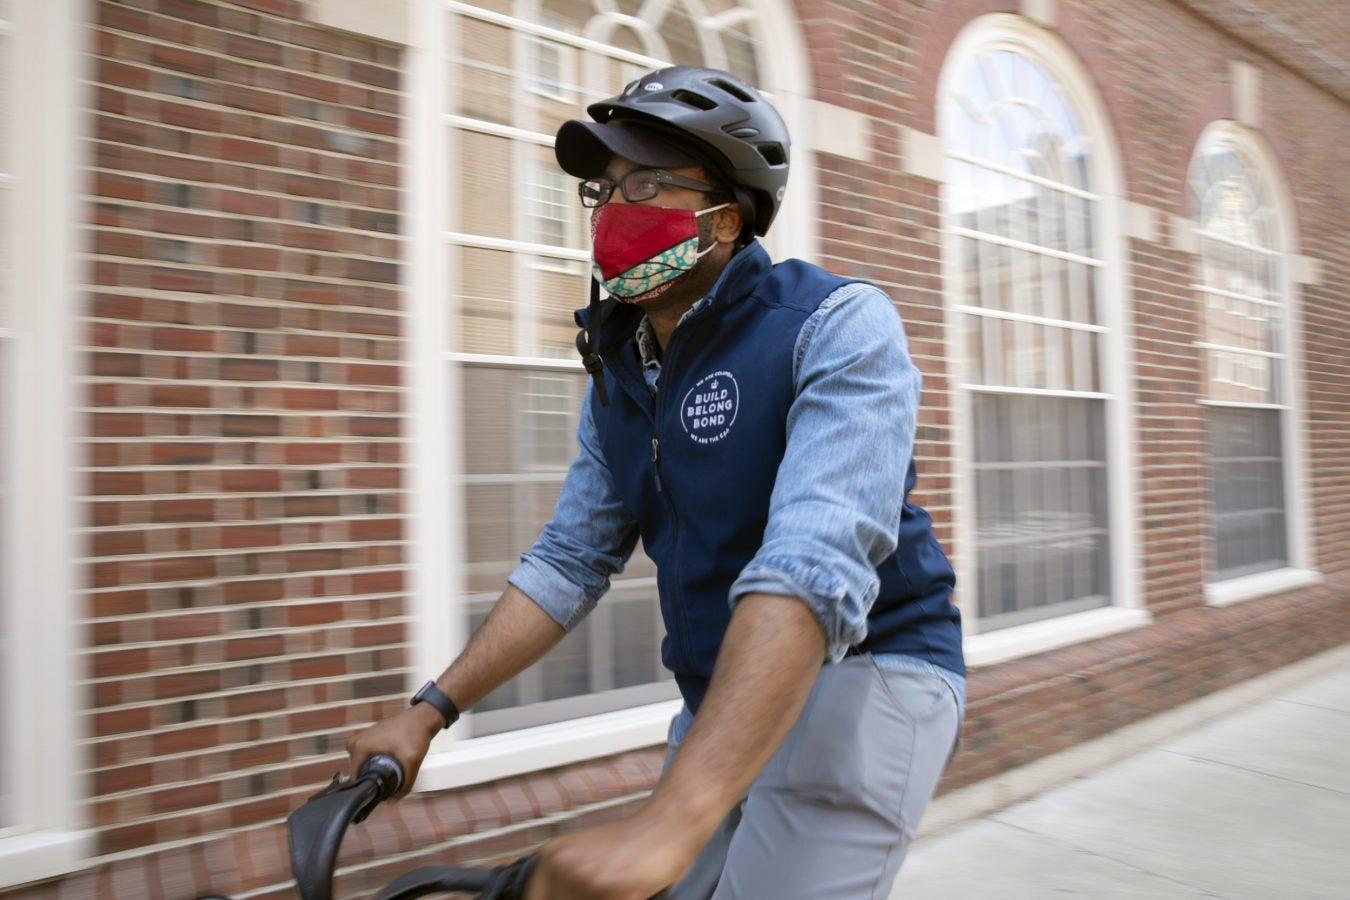 Darold Cuba, Harvard Kennedy School Mid career MPA rides a blue bike near Leverett House.